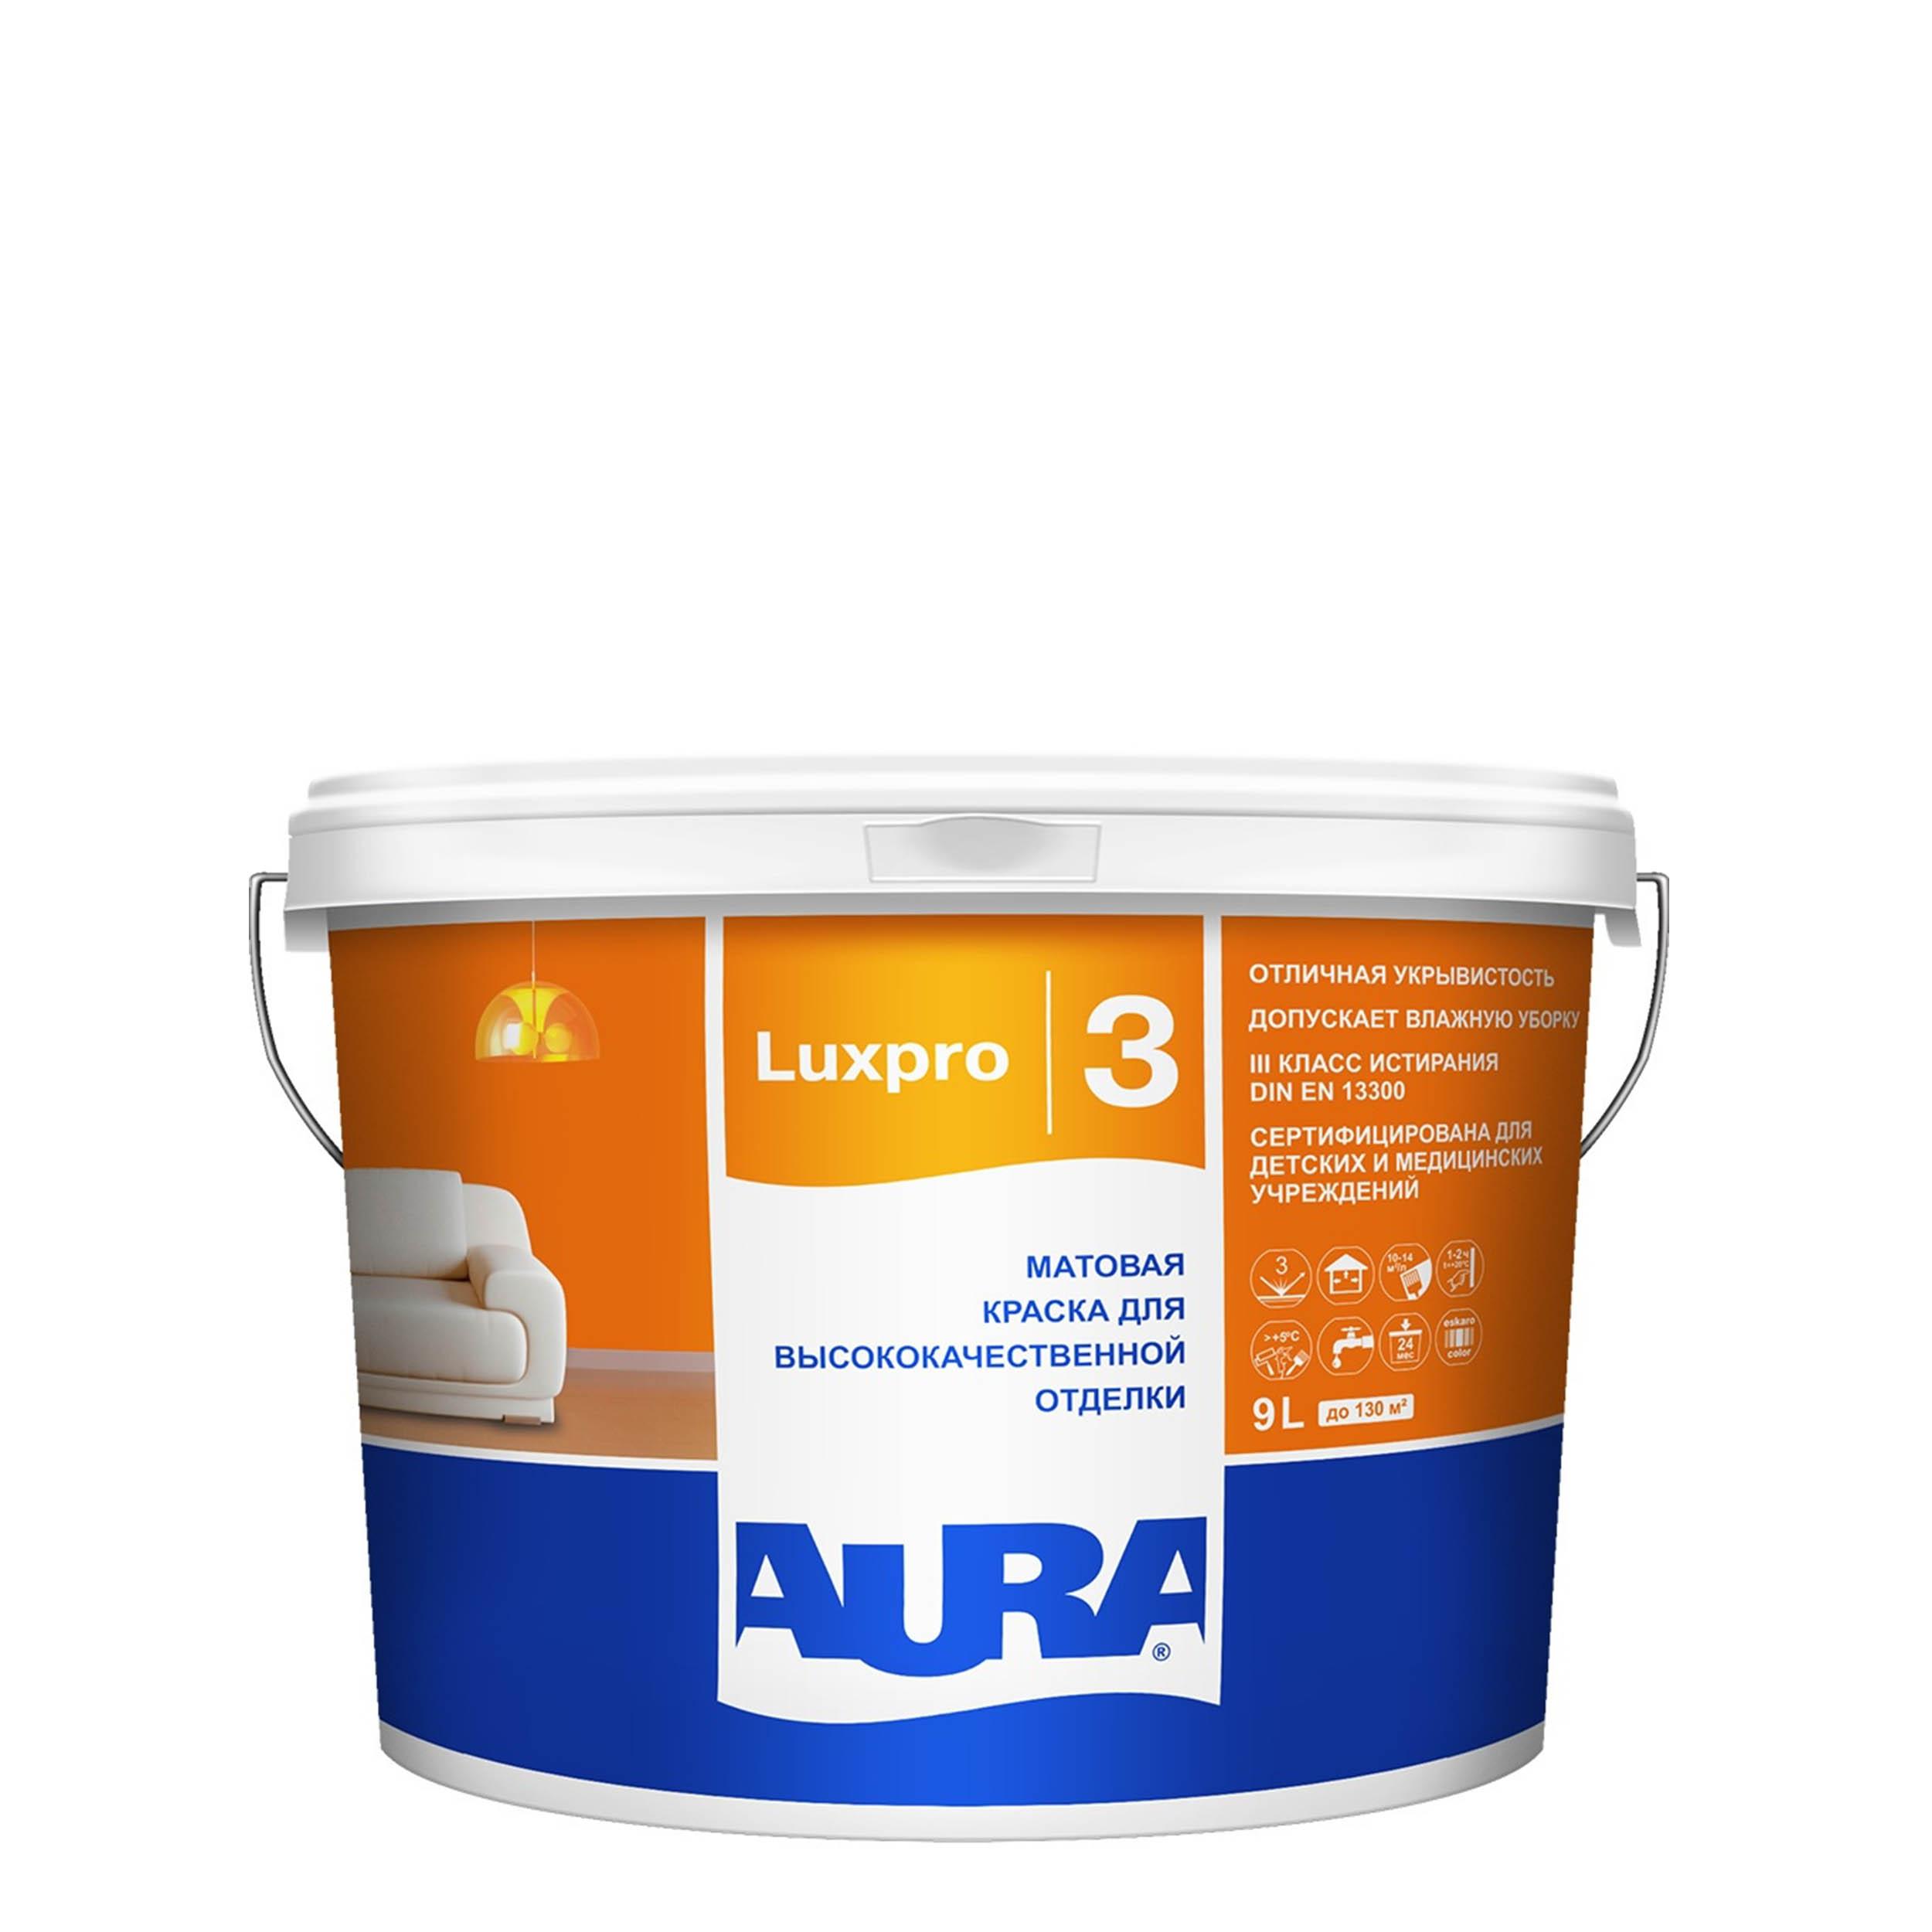 Фото 4 - Краска интерьерная, Aura LuxPRO 3, RAL 8000, 11 кг.